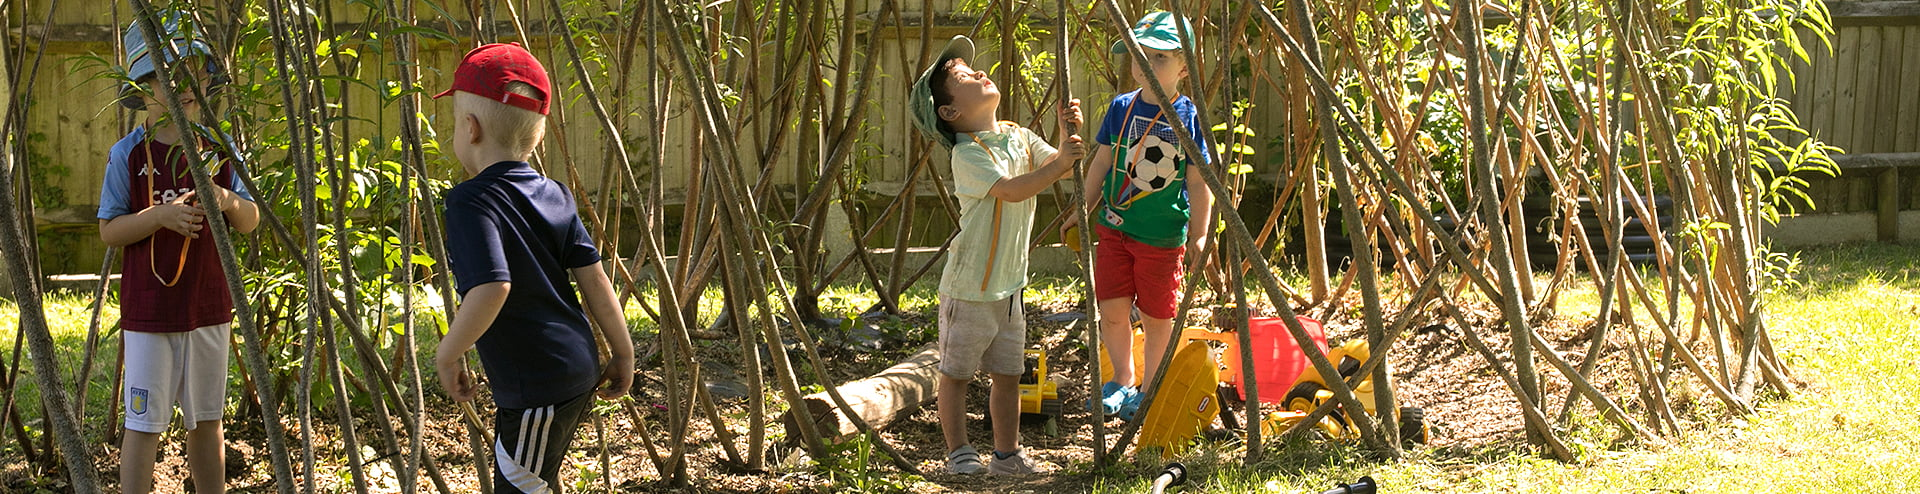 Boys playing in the Jigsaw Garden